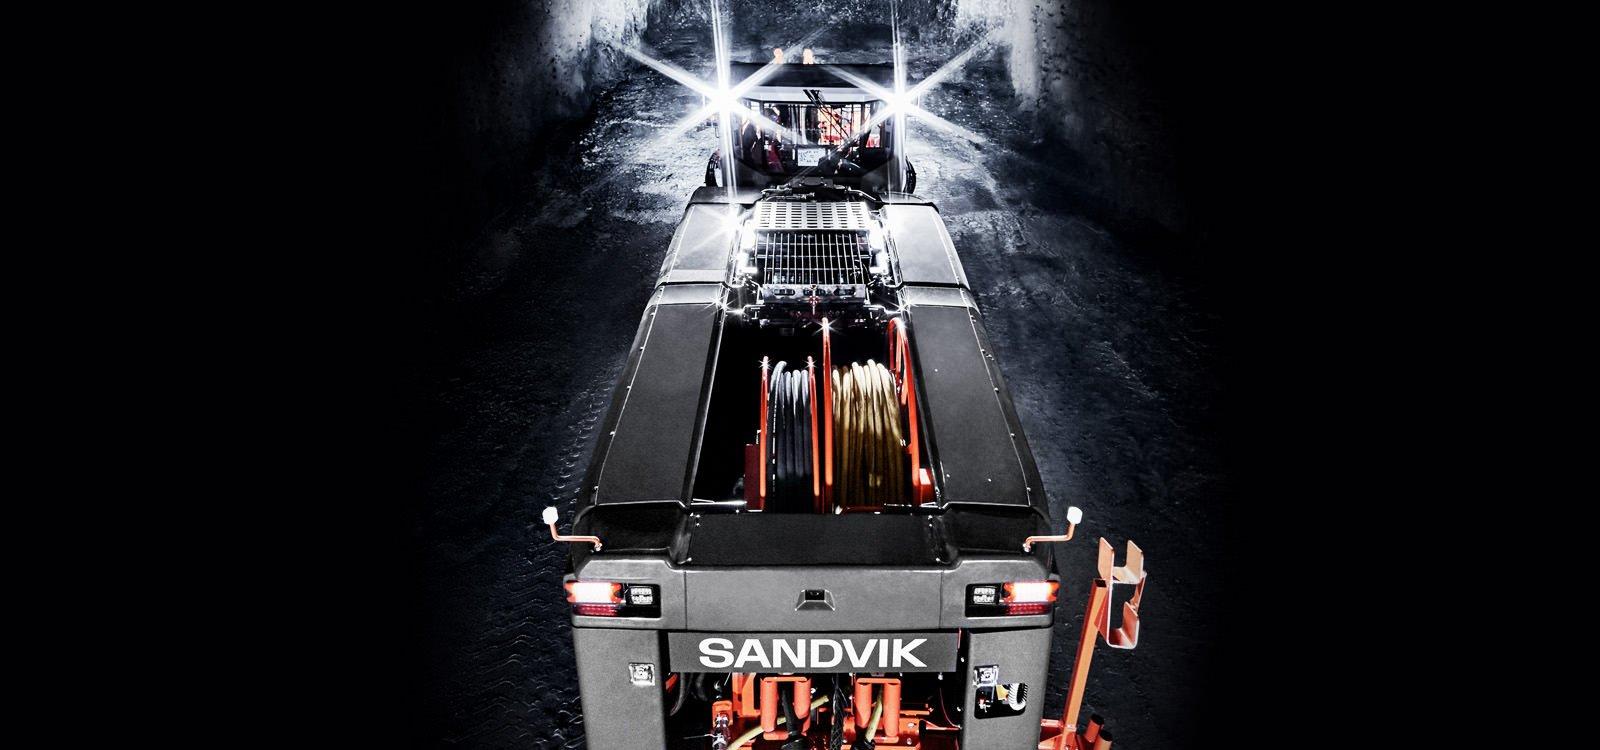 Sandvik DD422iE innovations include a 3D scanning navigation option and a new improved boom.